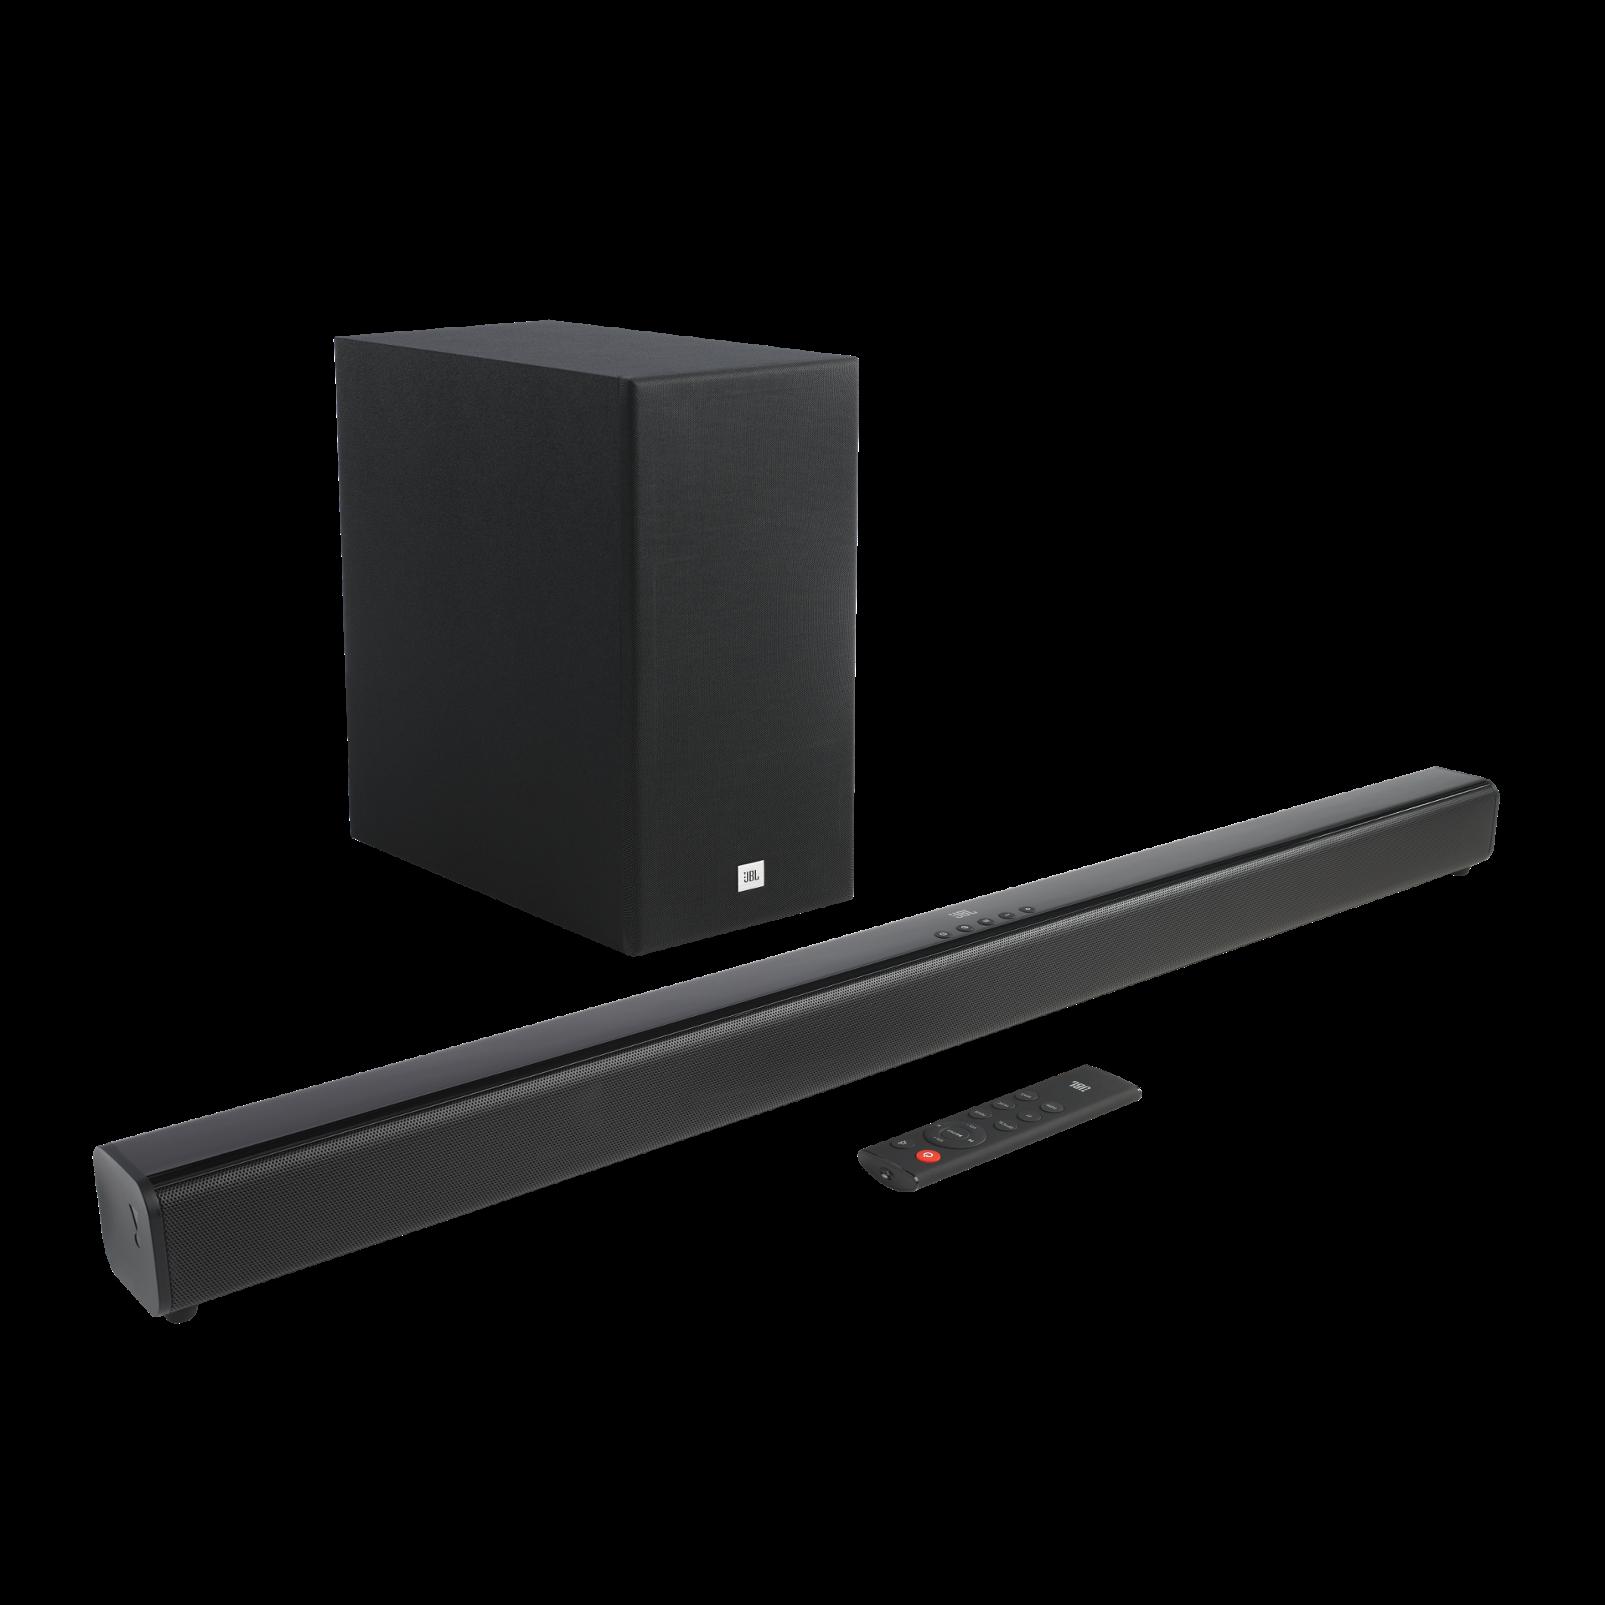 JBL Cinema SB160 - Black - 2.1 Channel soundbar with wireless subwoofer - Hero